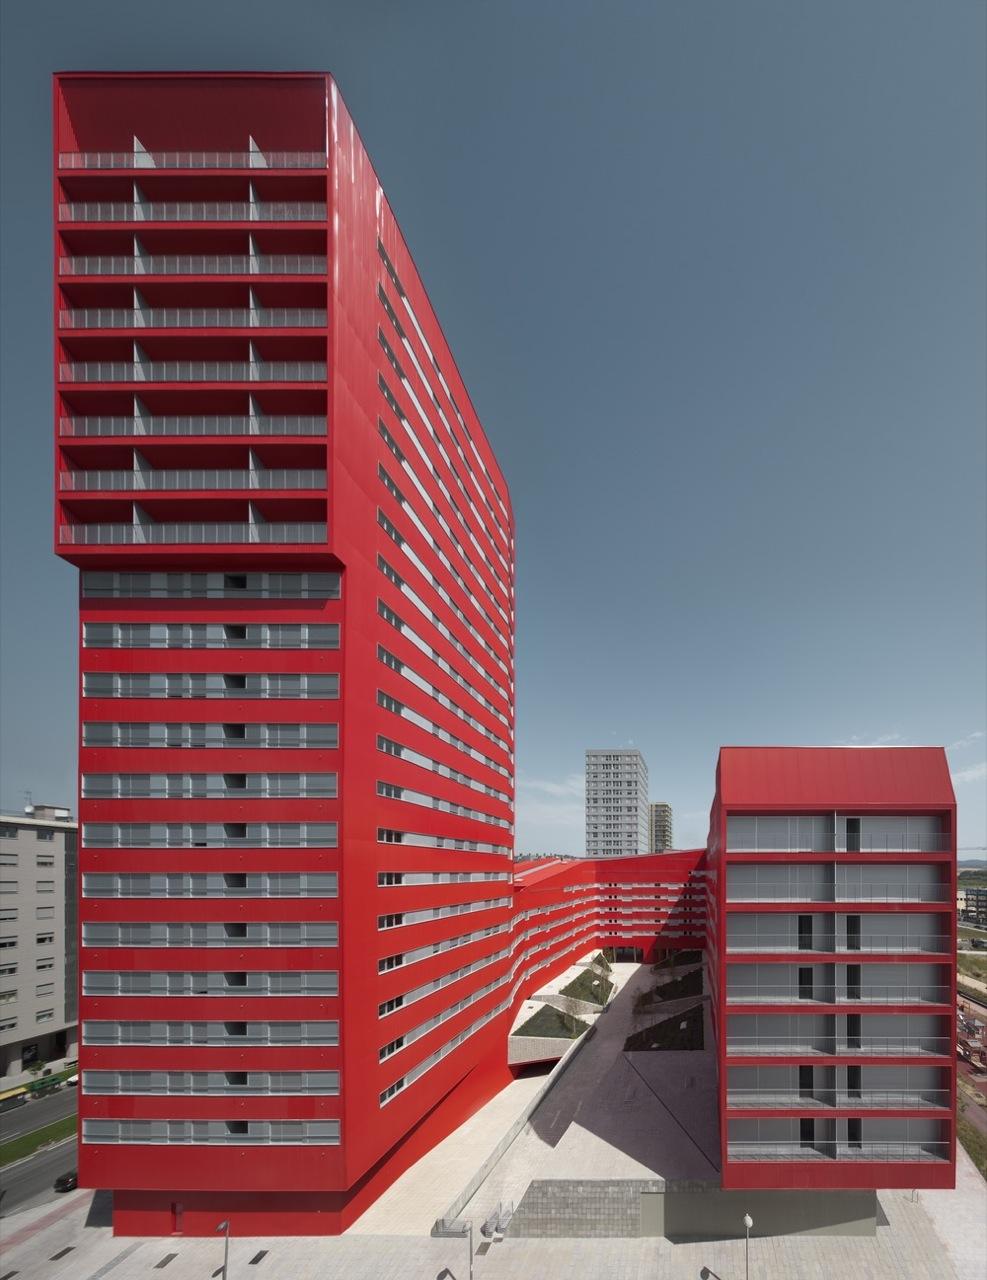 Conjunto Habitacional em Salburúa / ACXT, © Aitor Ortiz